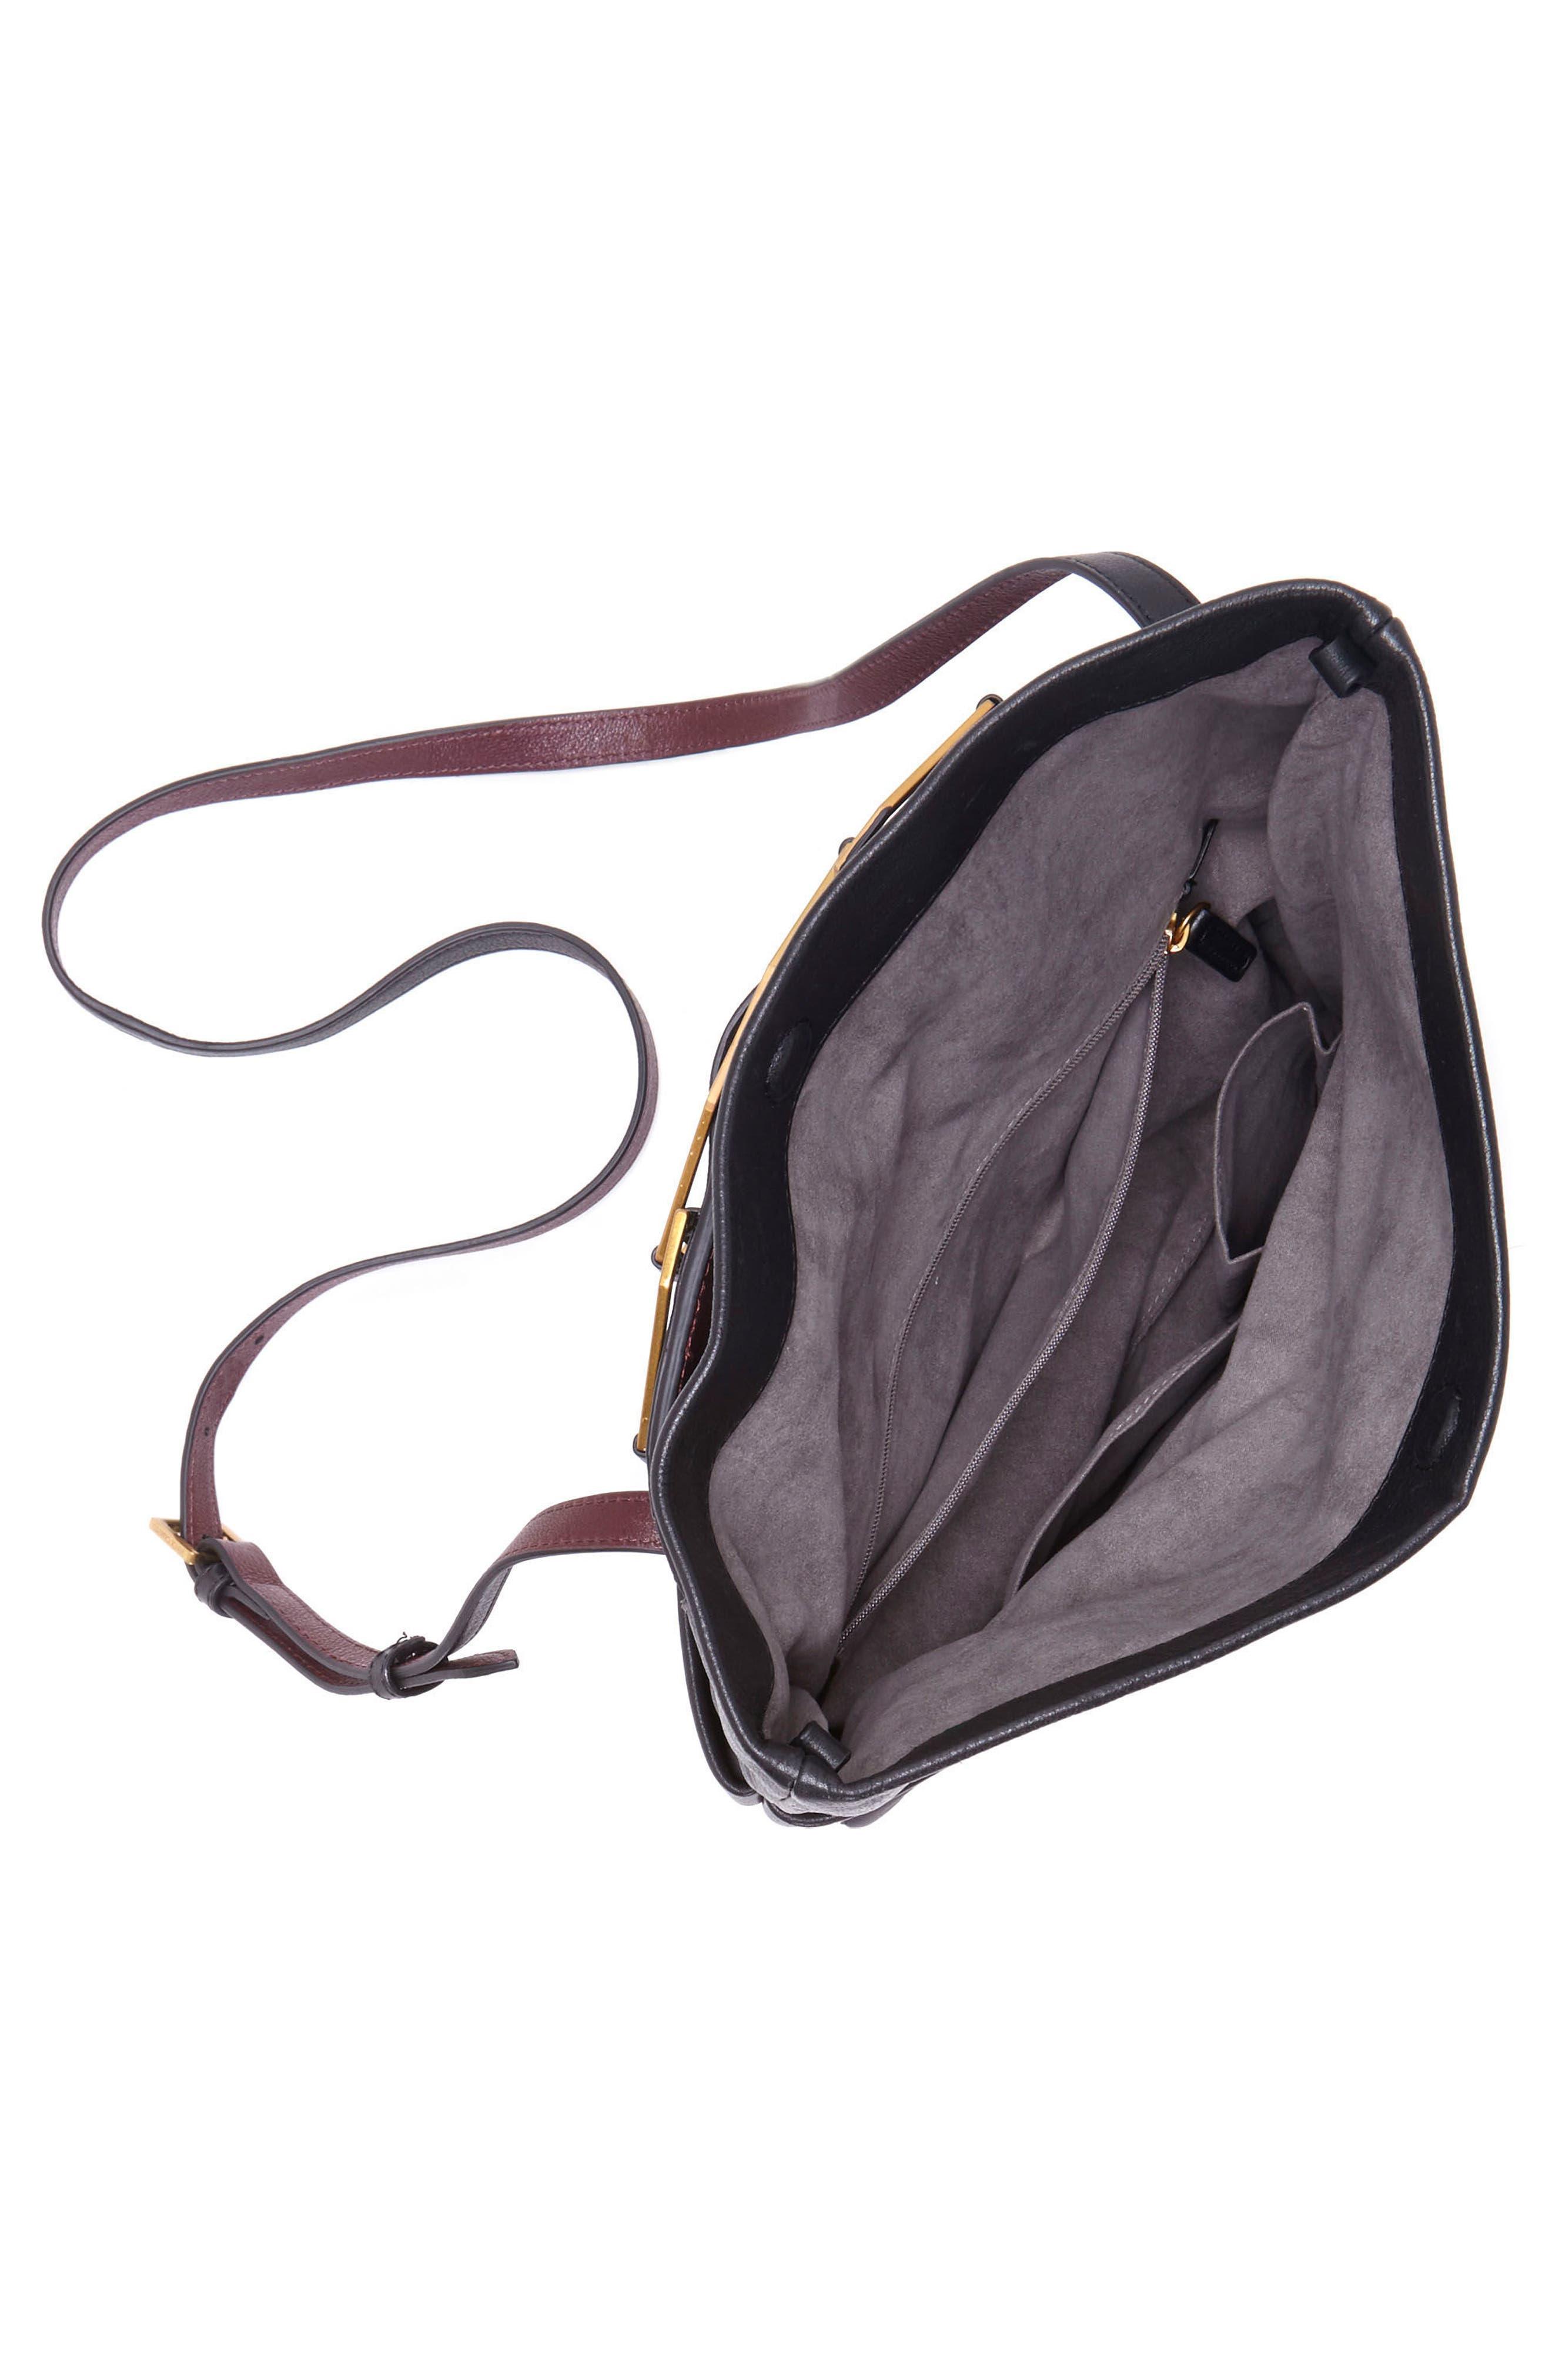 Alternate Image 3  - Vince Camuto Luk Leather Foldover Clutch